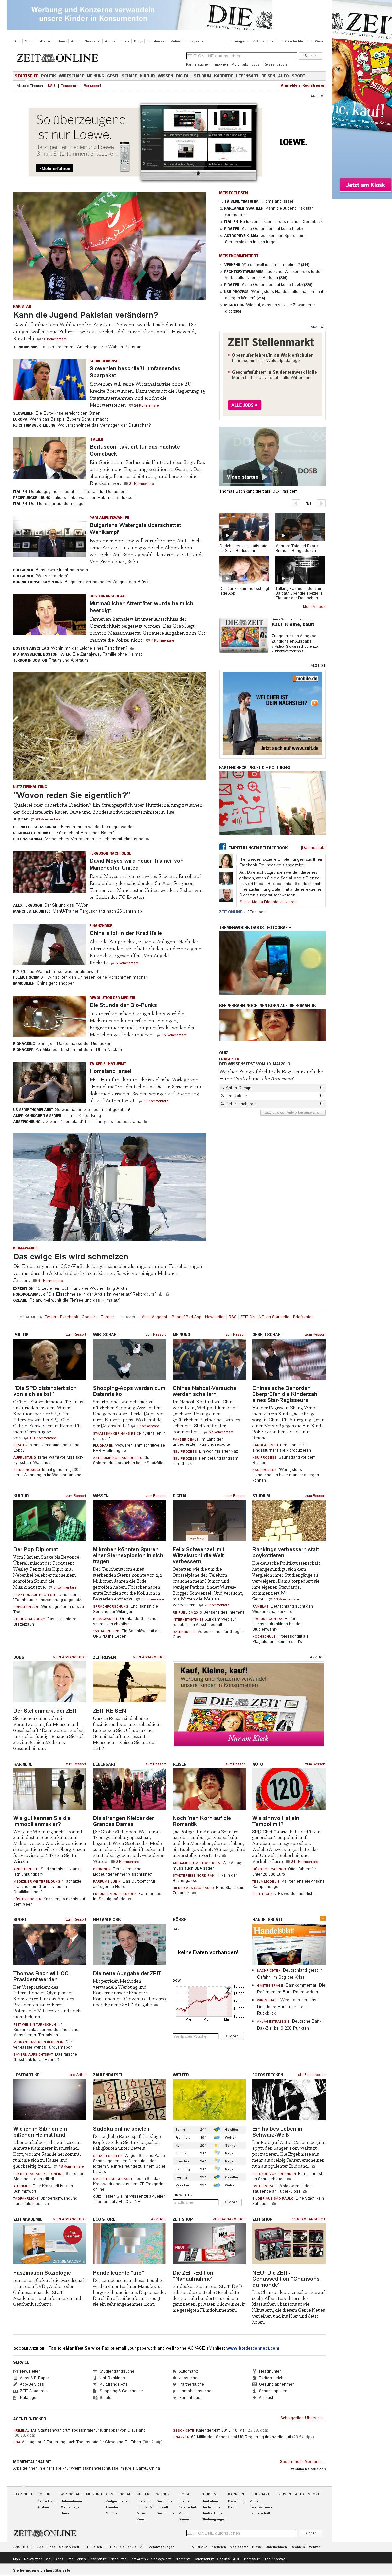 Zeit Online at Thursday May 9, 2013, 10:53 p.m. UTC